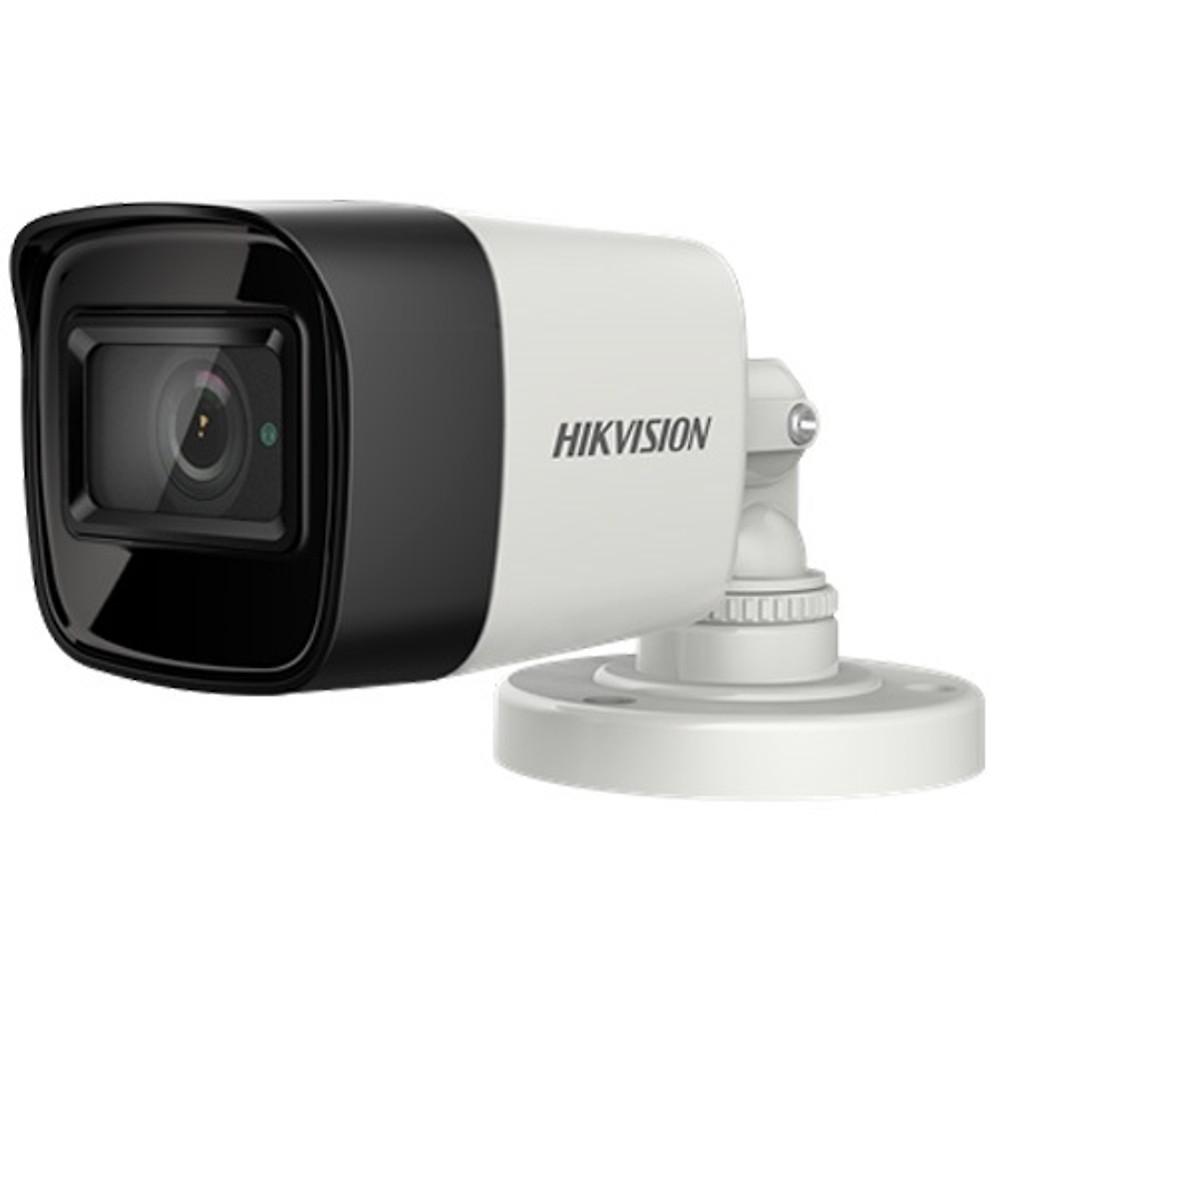 Camera DS-2CE16D3T-IT- TVI 2MP - HIKVISON